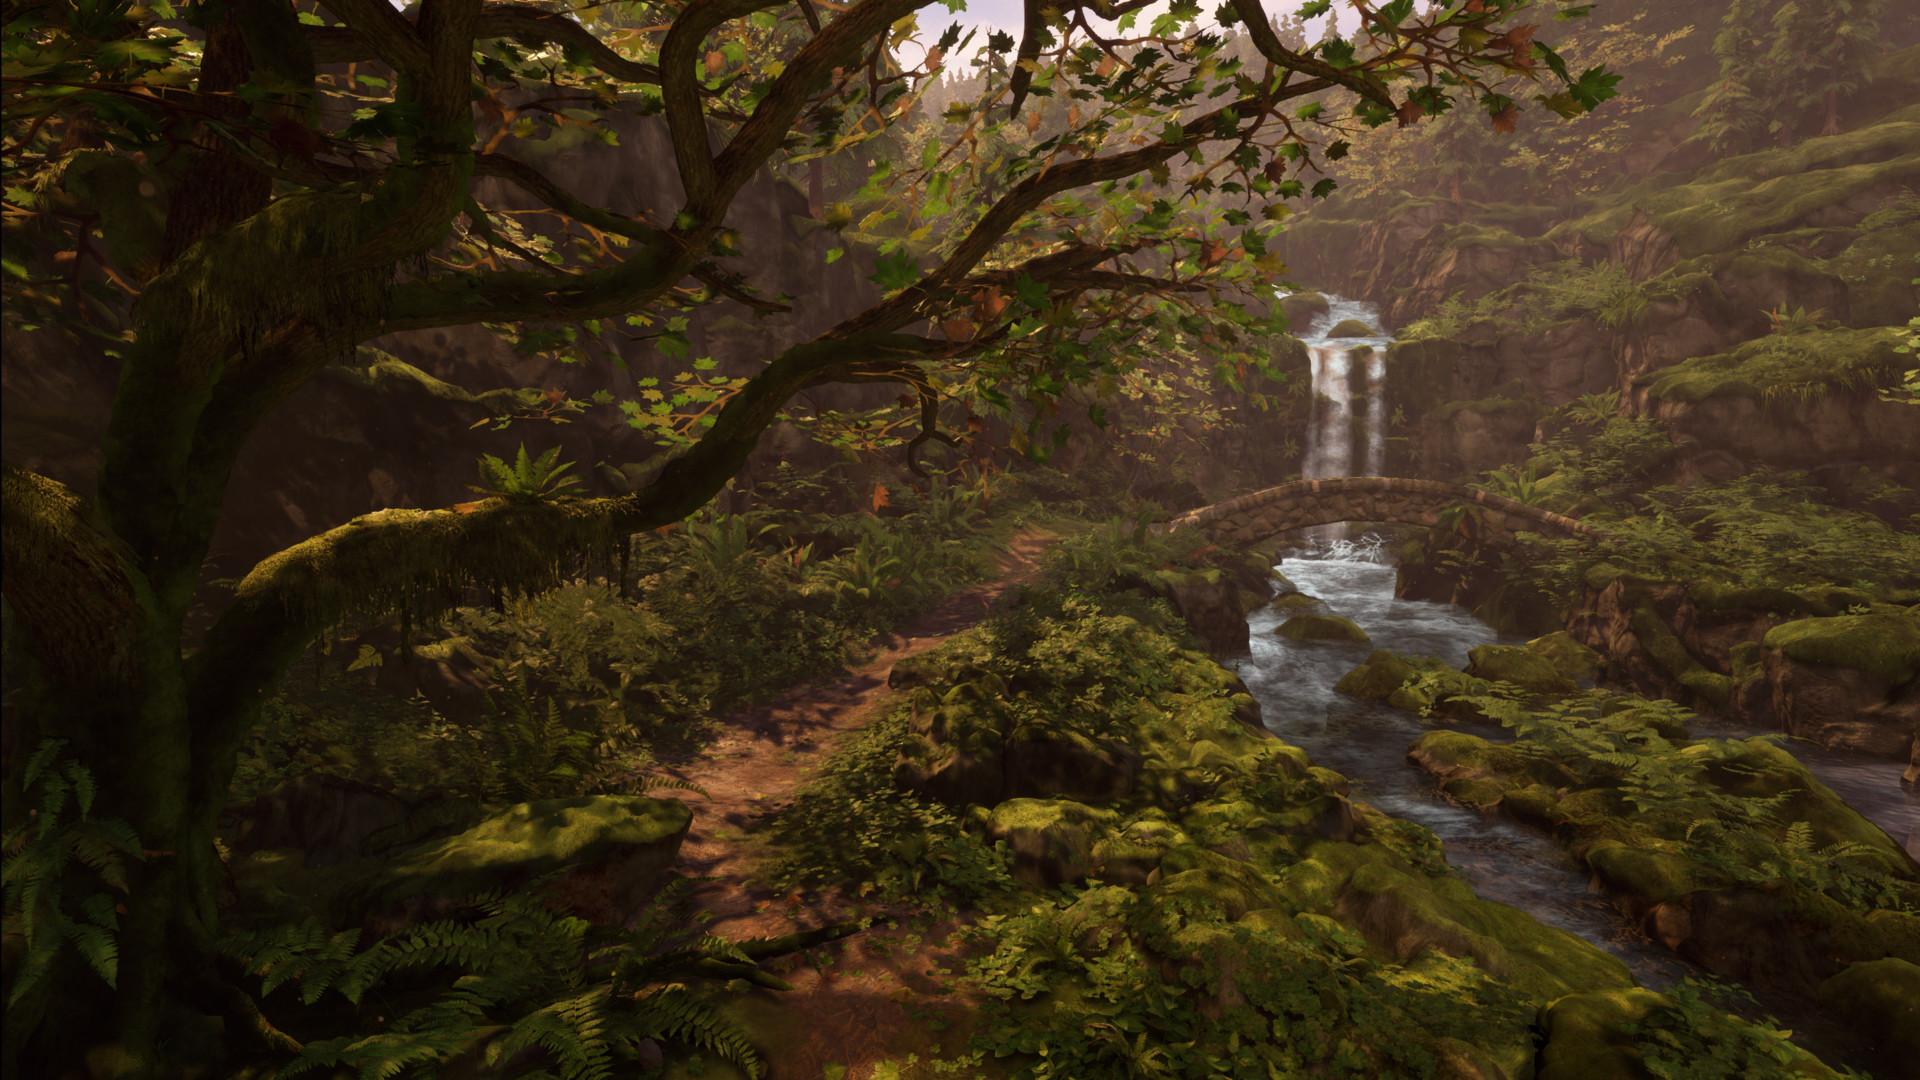 Alina godfrey enchanted falls path